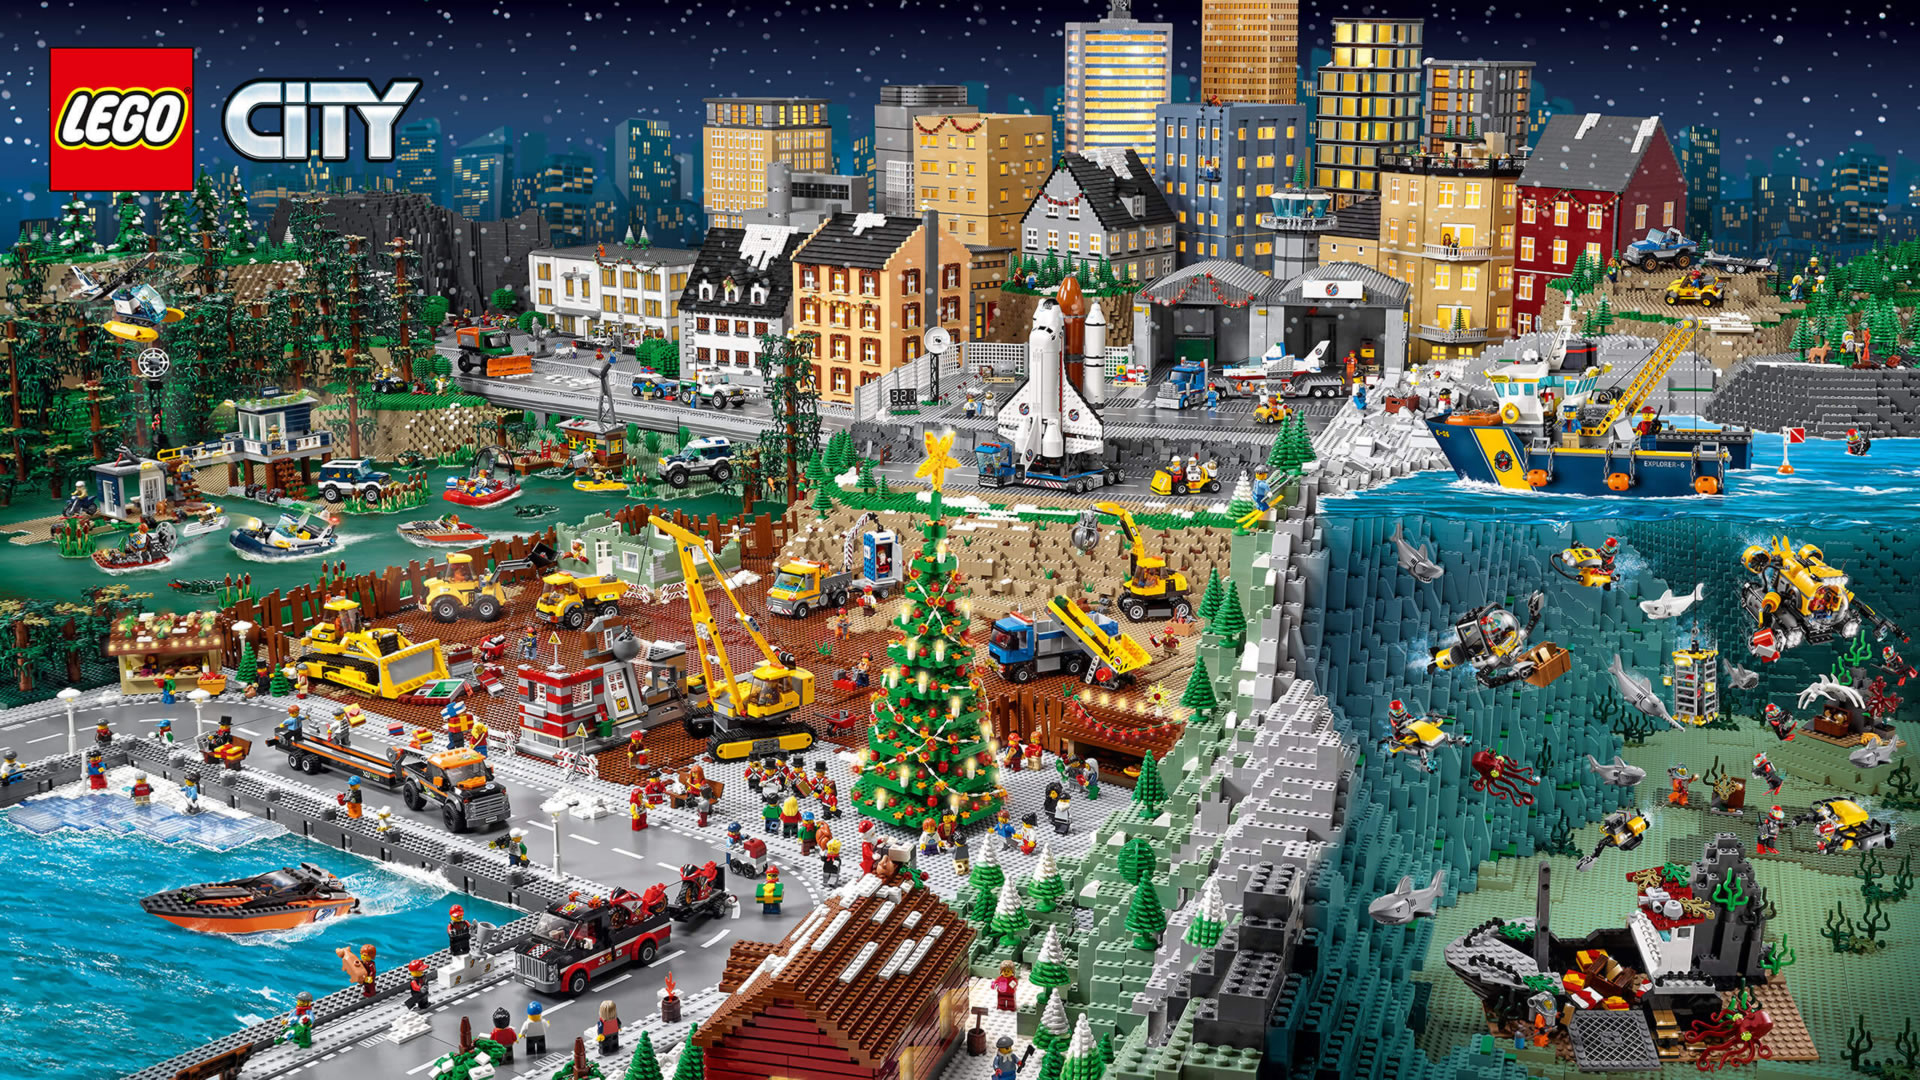 download wallpaper: kerst in LEGO City wallpaper